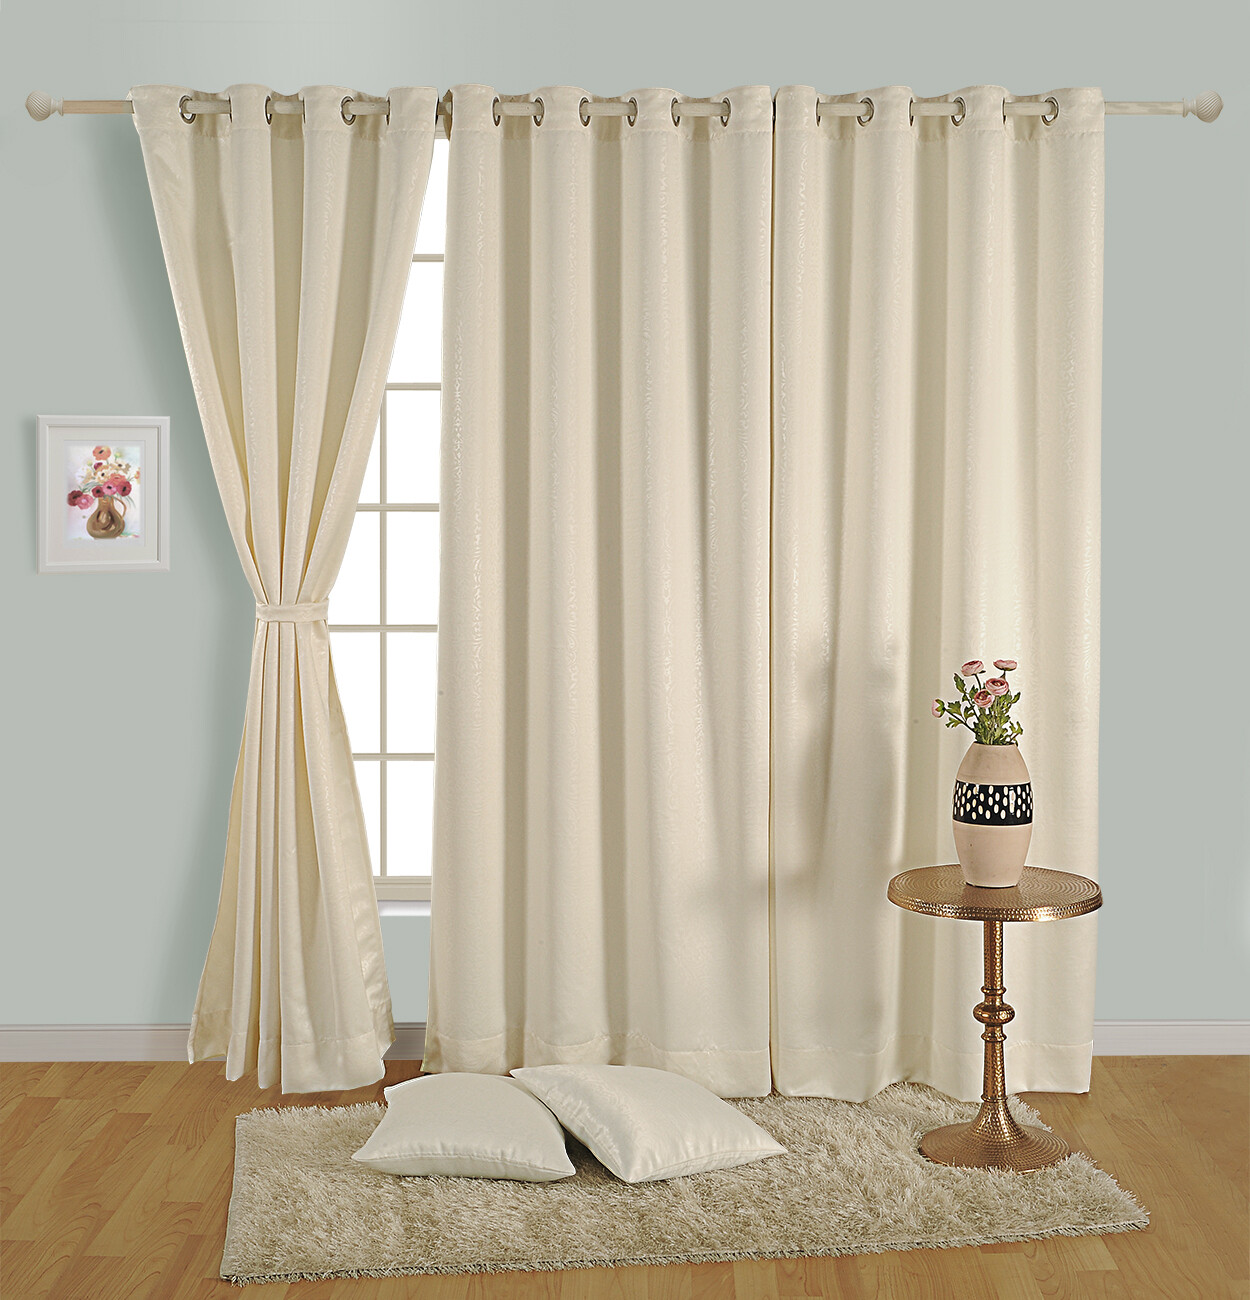 Swayam Off White Colour Paisley J&B Blackout Eyelet Curtain for Door